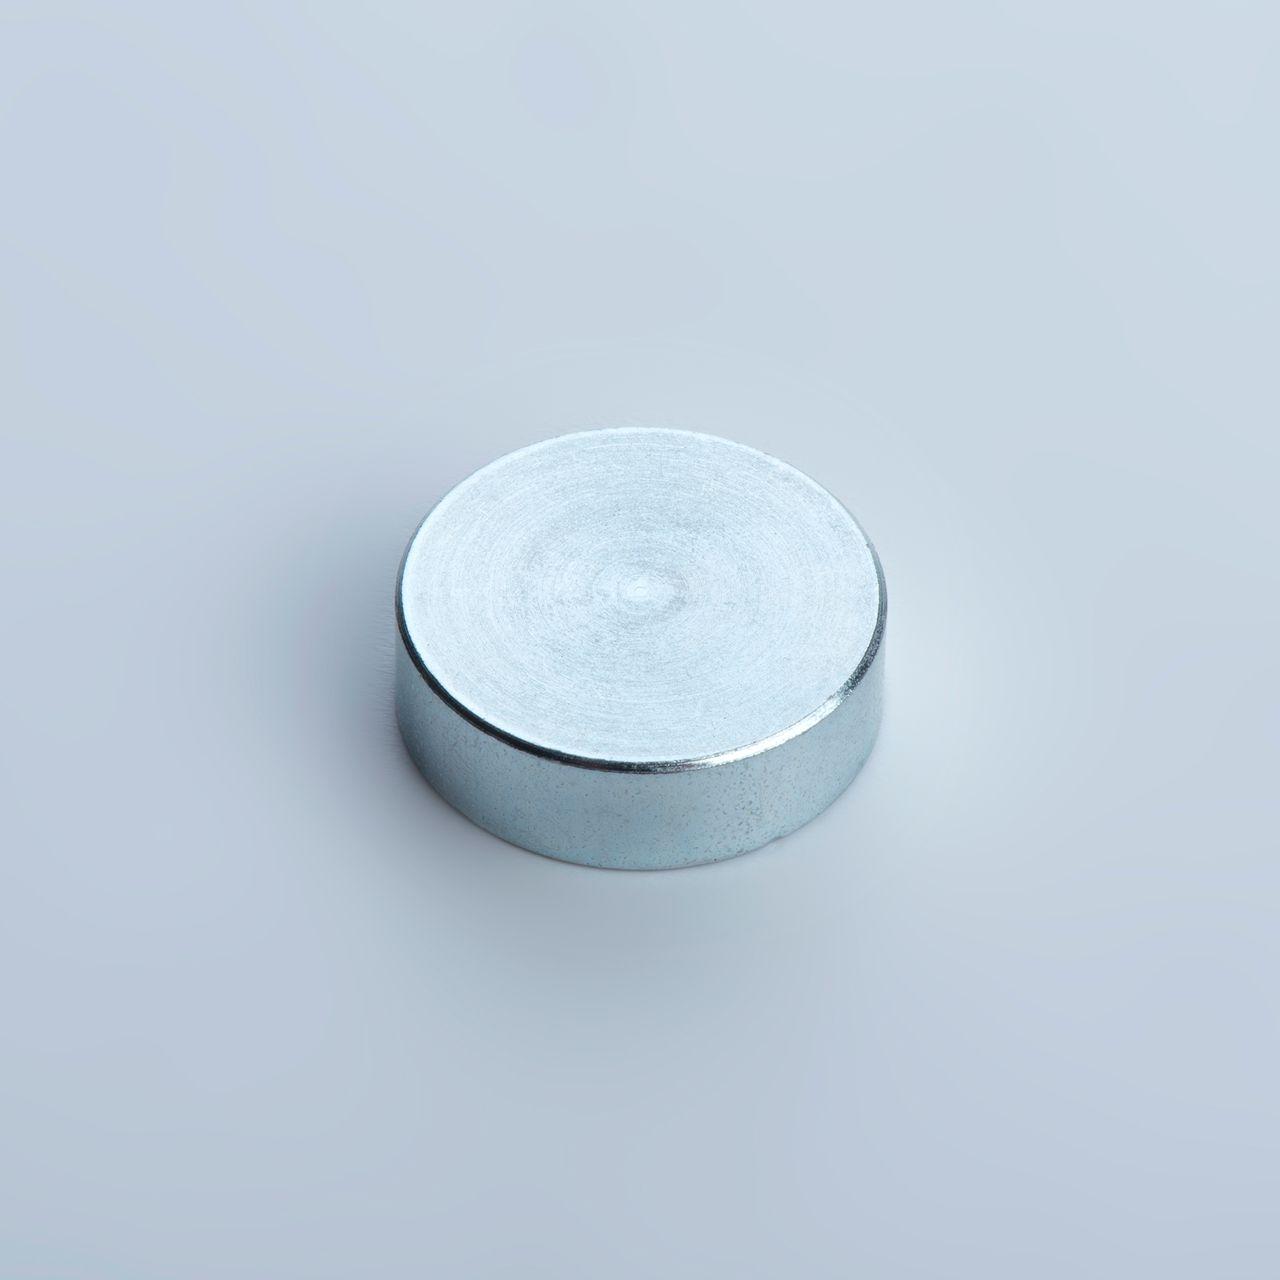 Flachgreifer aus Hartferrit, verzinkt, thyssenkrupp Magnettechnik